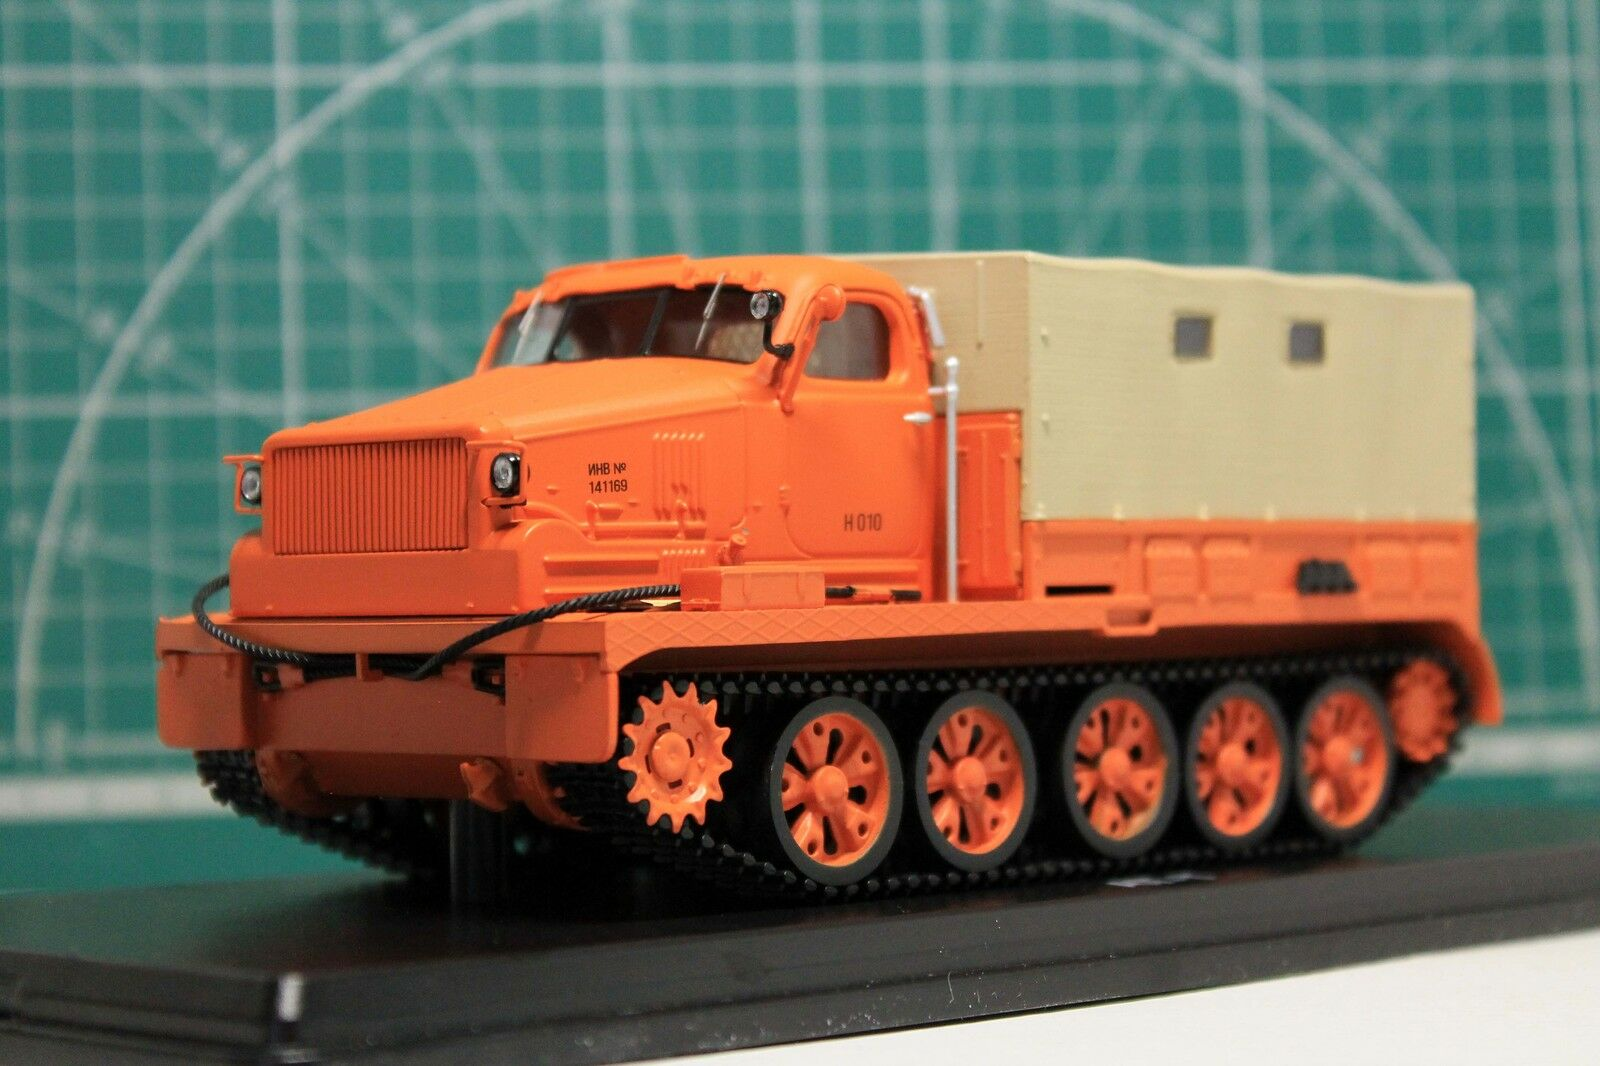 1:43 a-T (chasis de T-54 tanque) Todo Terreno Naranja (SSM3006)